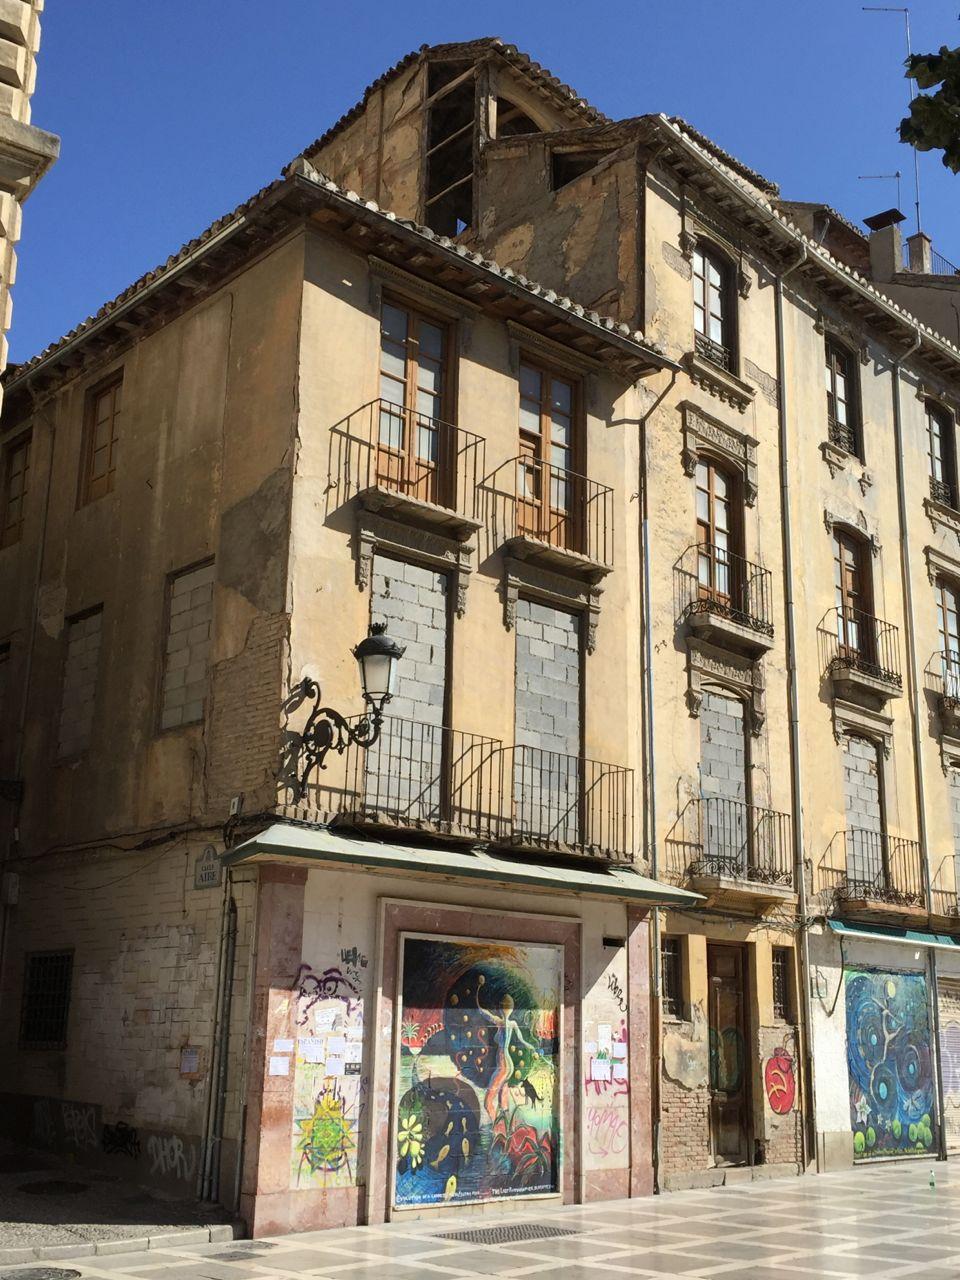 Some examples of street art in the Plaza Nueva, Albaicin, Granada.